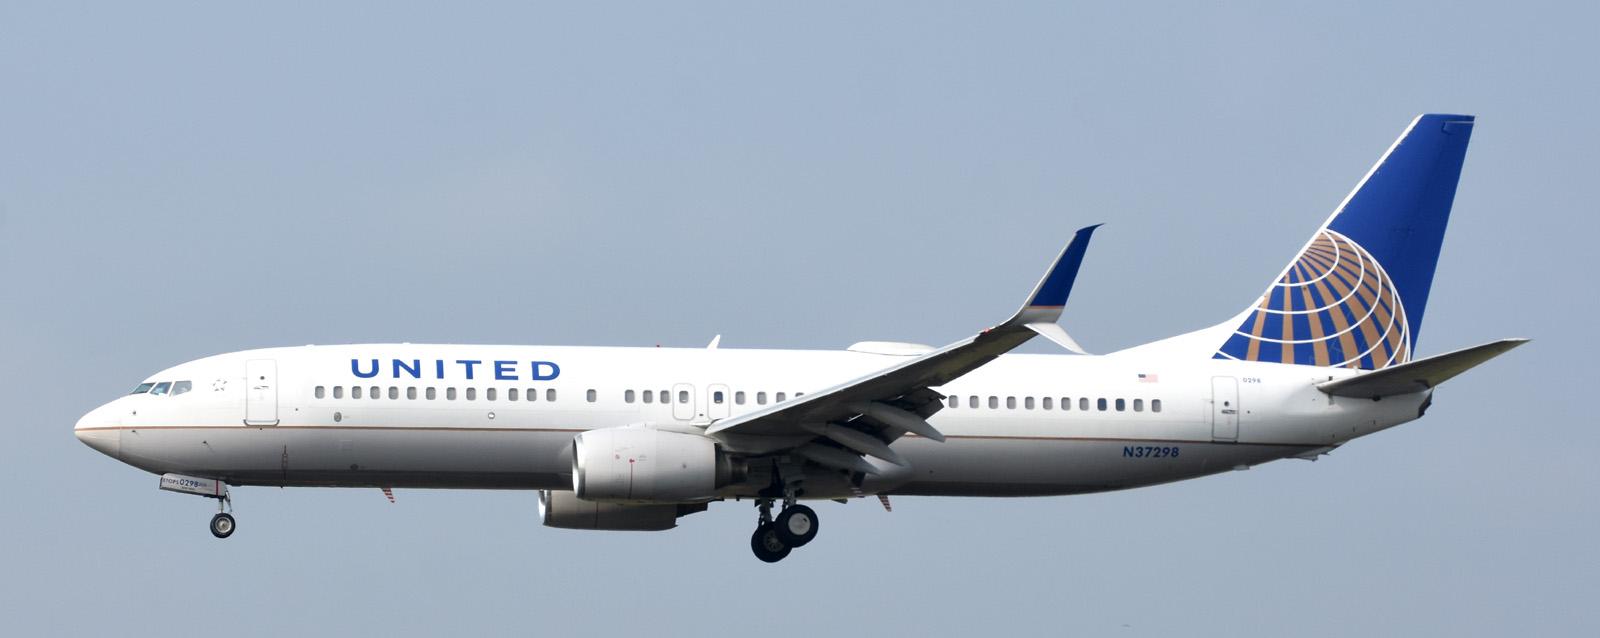 United171011g652